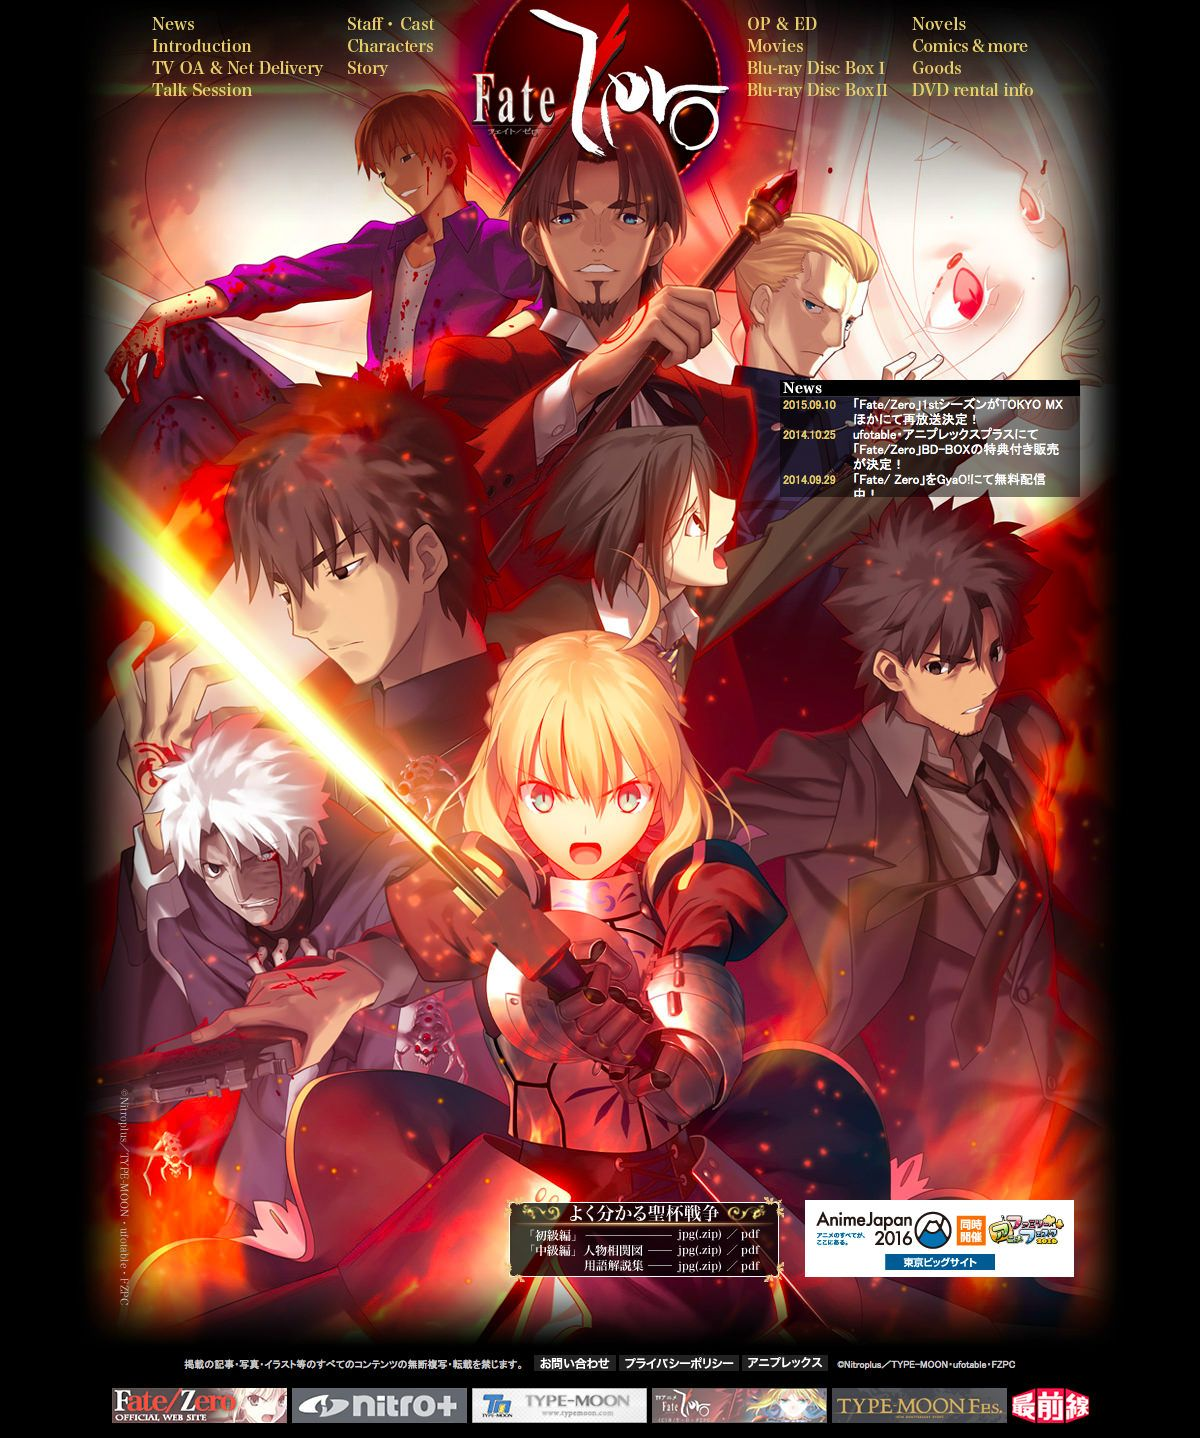 Fate/Zero 運命ステイナイト、アニメ、イラスト